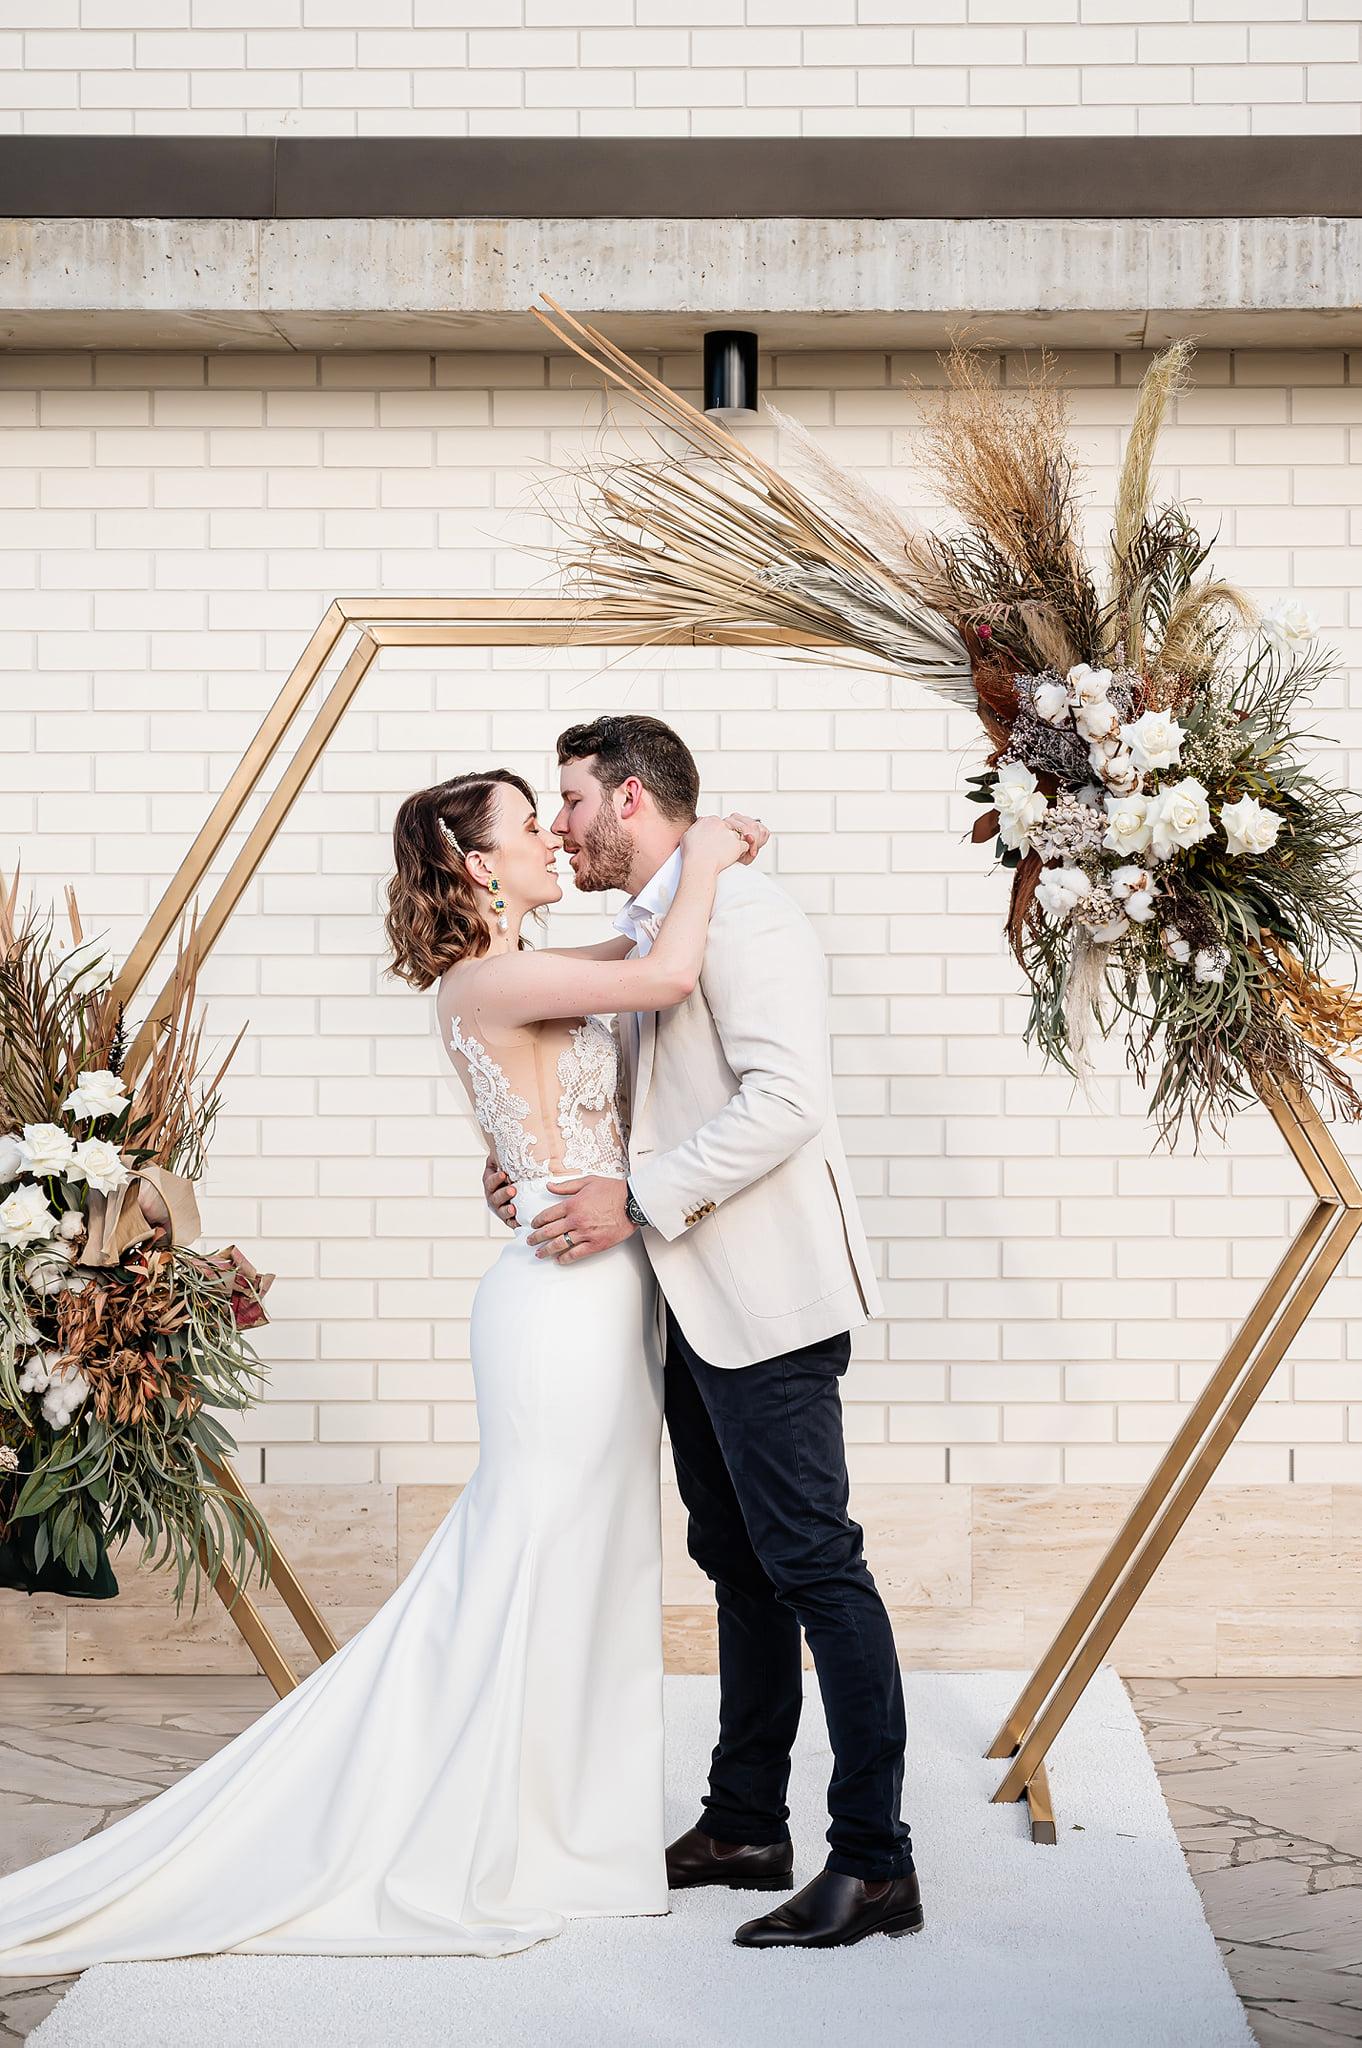 Calile Hotel wedding ceremony arbour